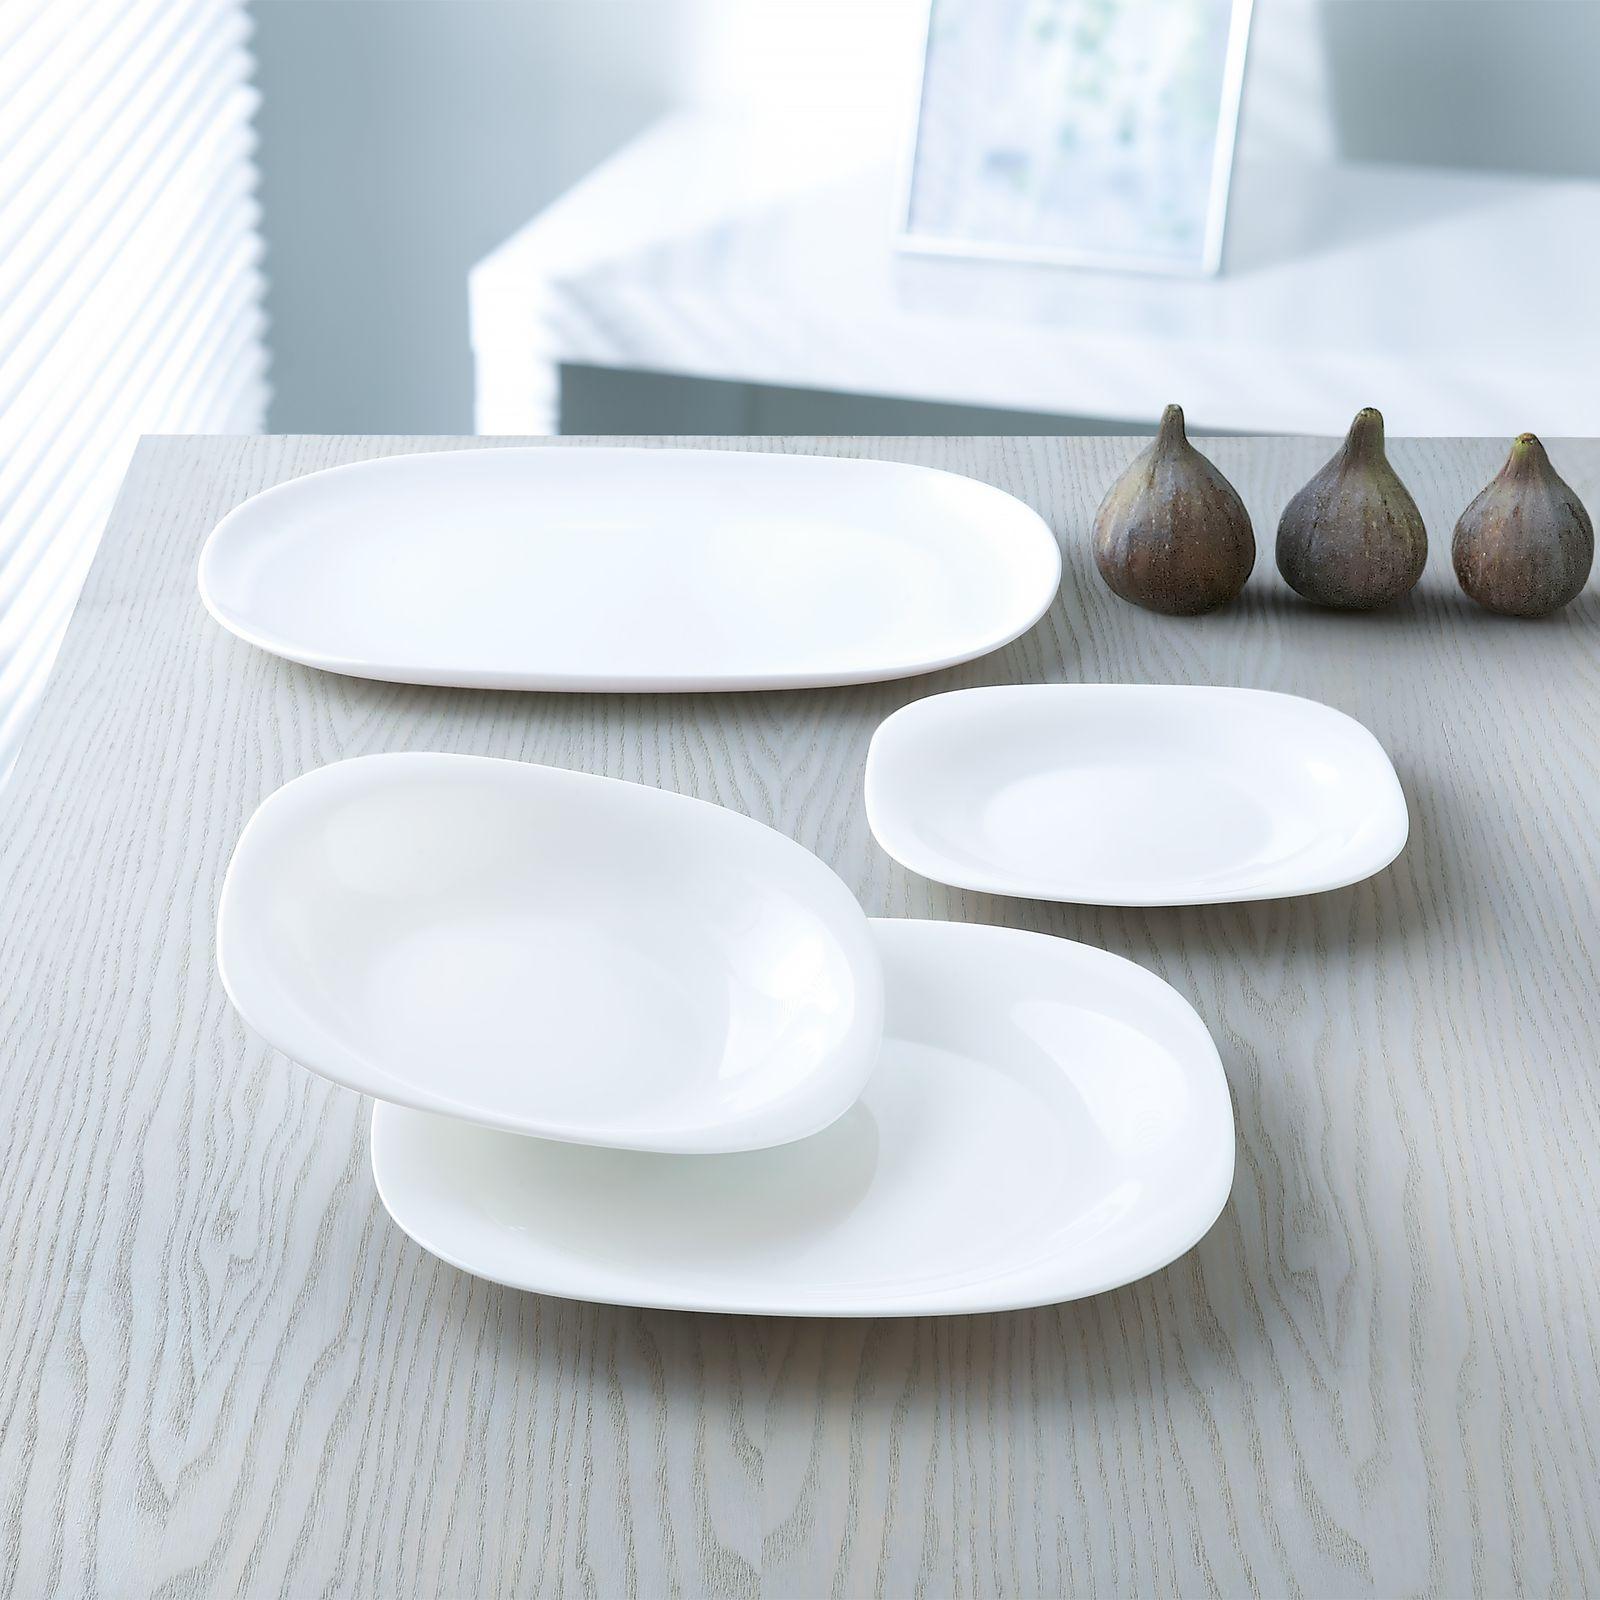 Service de table Carine Neo blanc 216-pièces LUMINARC